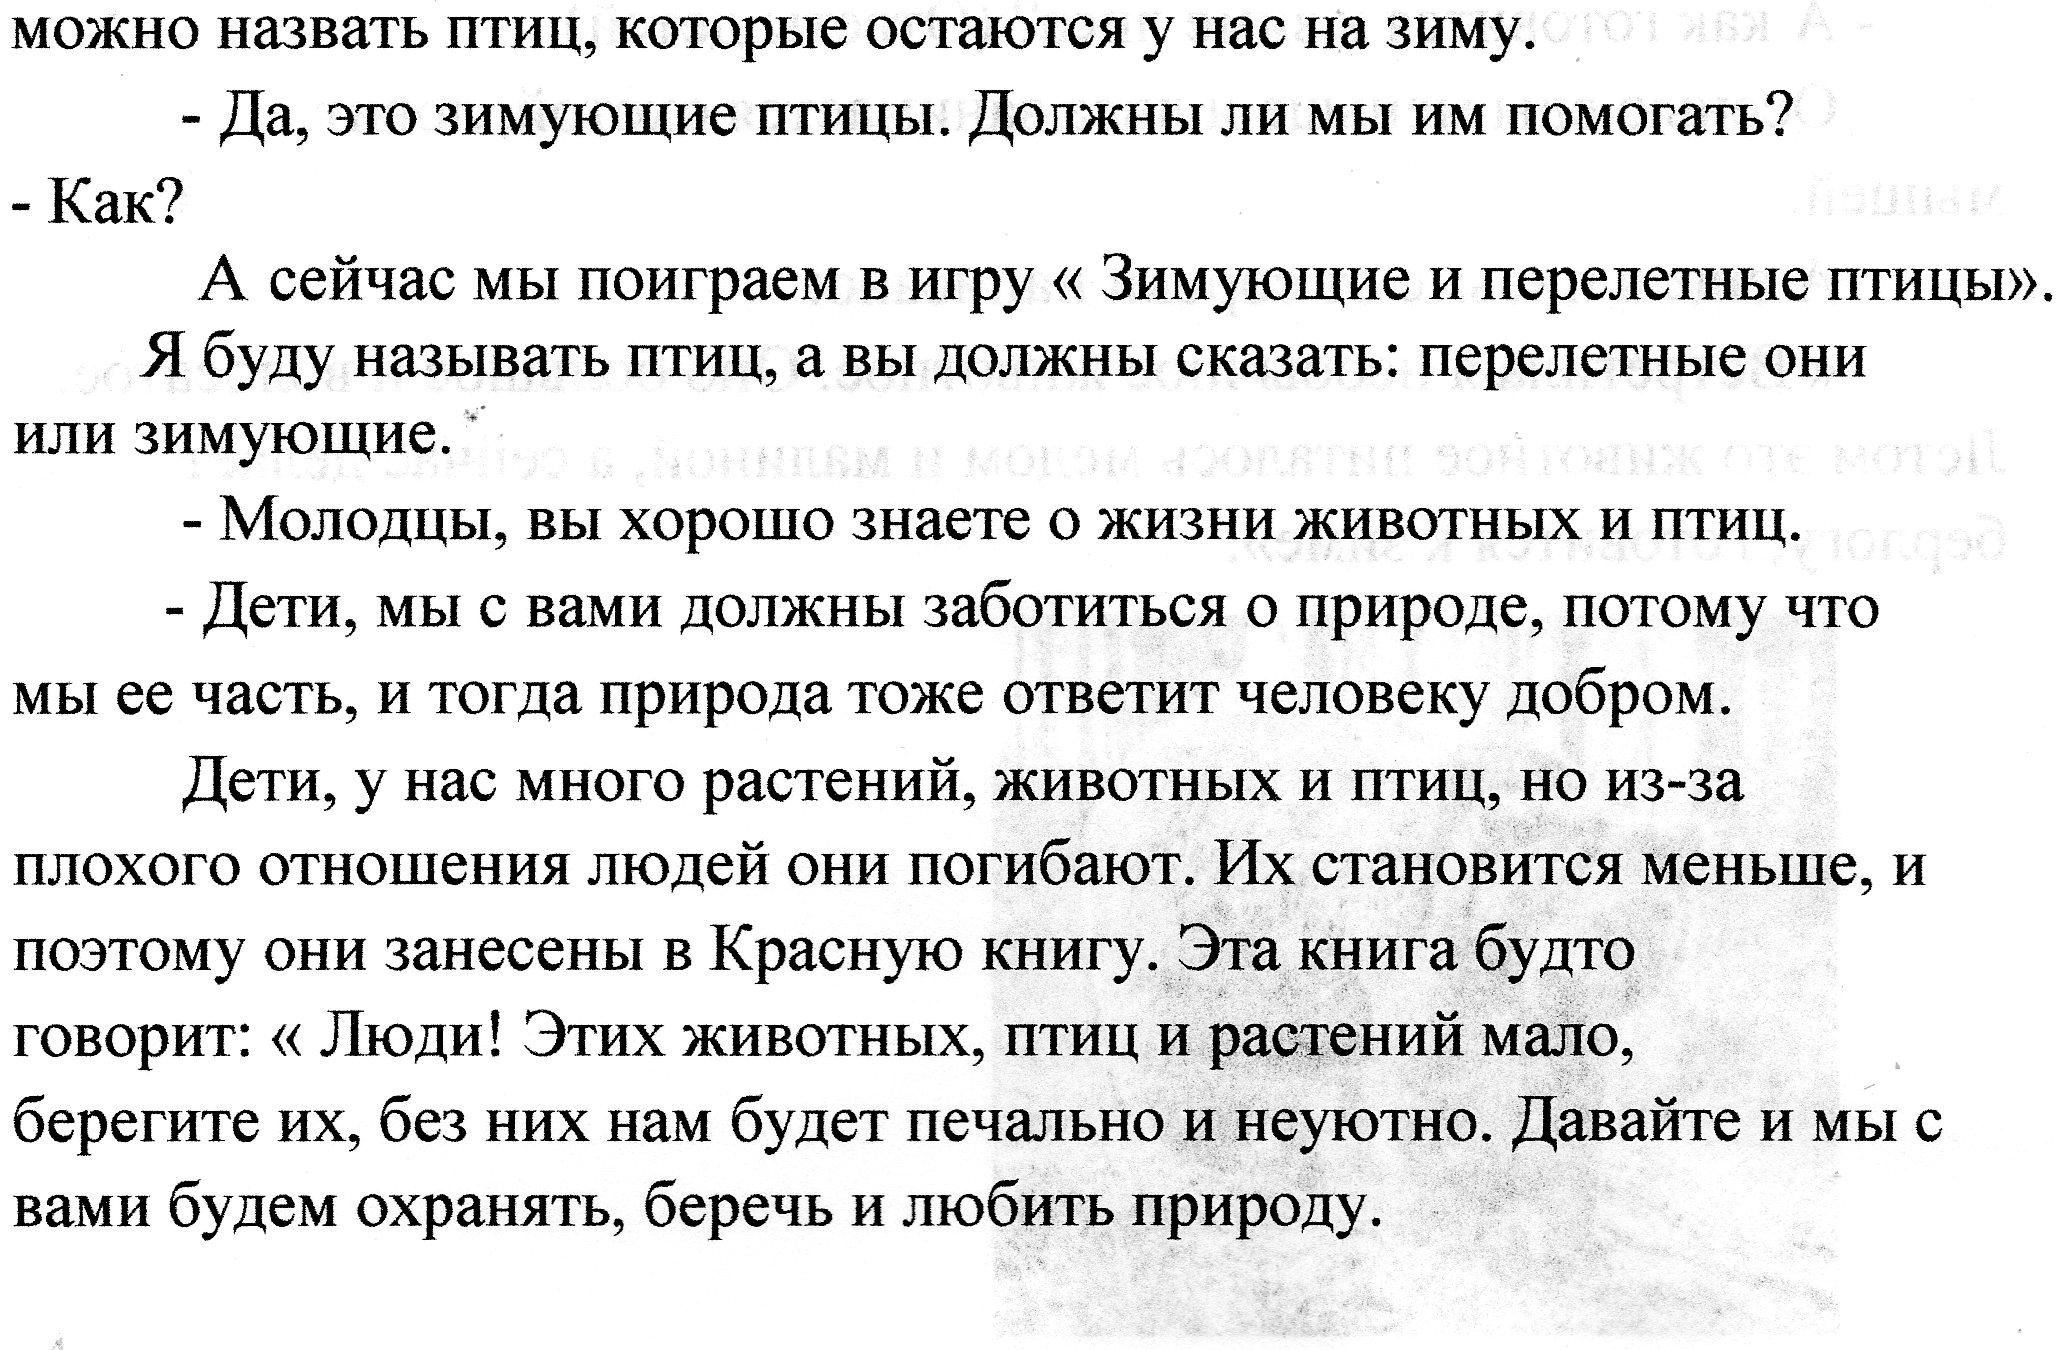 C:\Users\Александр\Pictures\img021.jpg